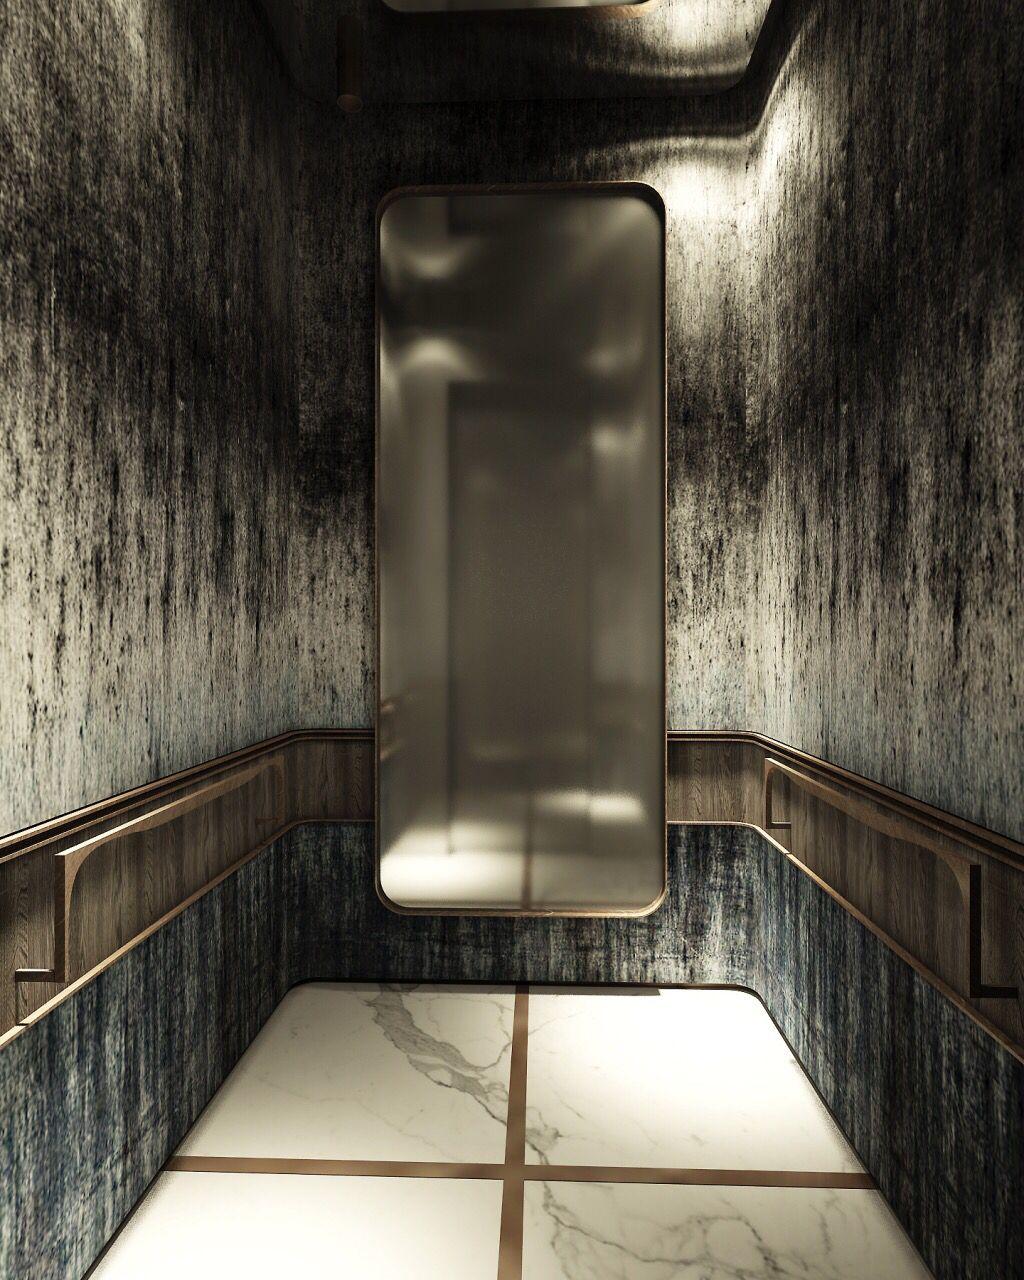 Lighting Basement Washroom Stairs: Pin By KIANGLIX On P_Le Maridian